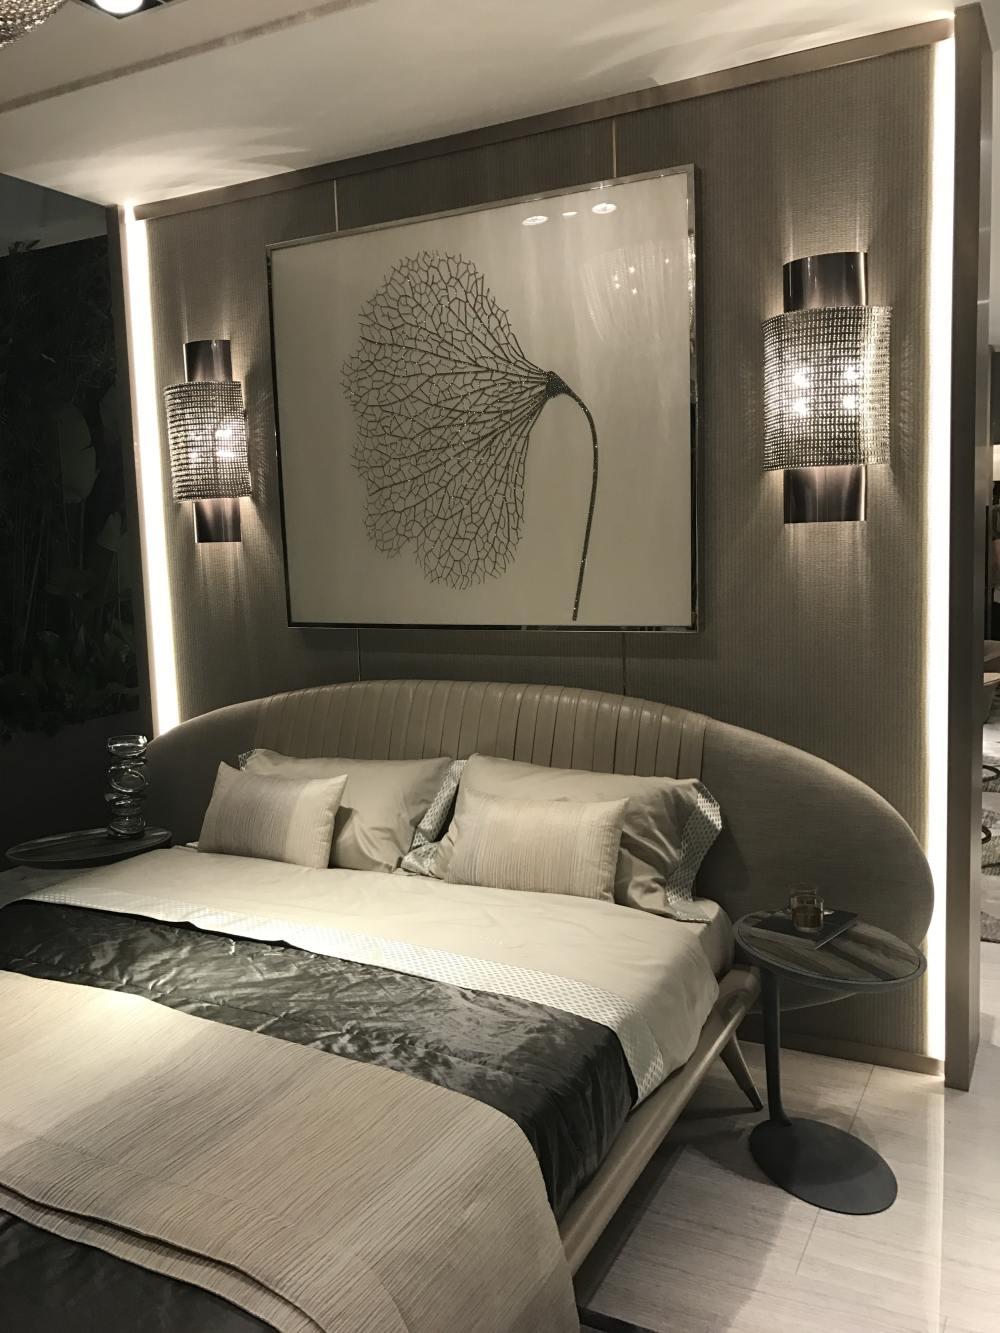 Platform Beds Bedroom Interior Design Ideas